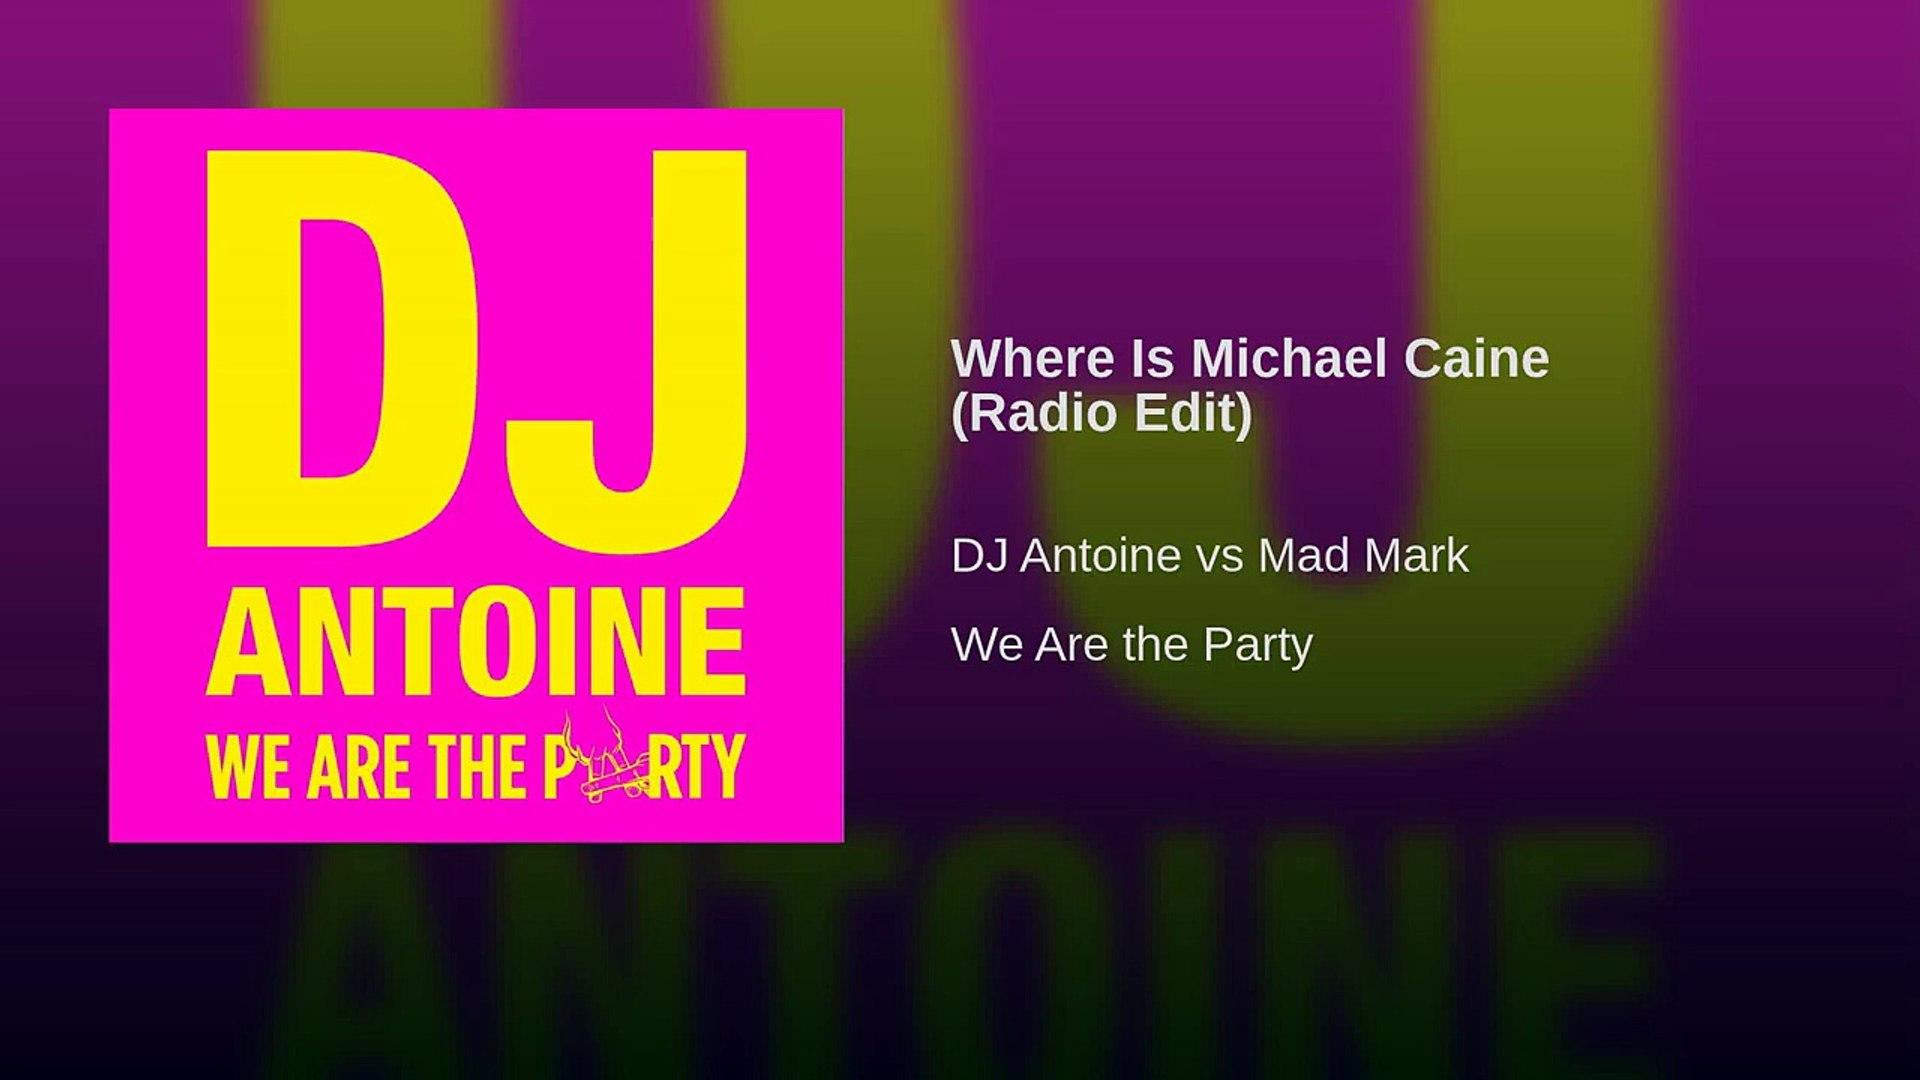 Where Is Michael Caine (Radio Edit)